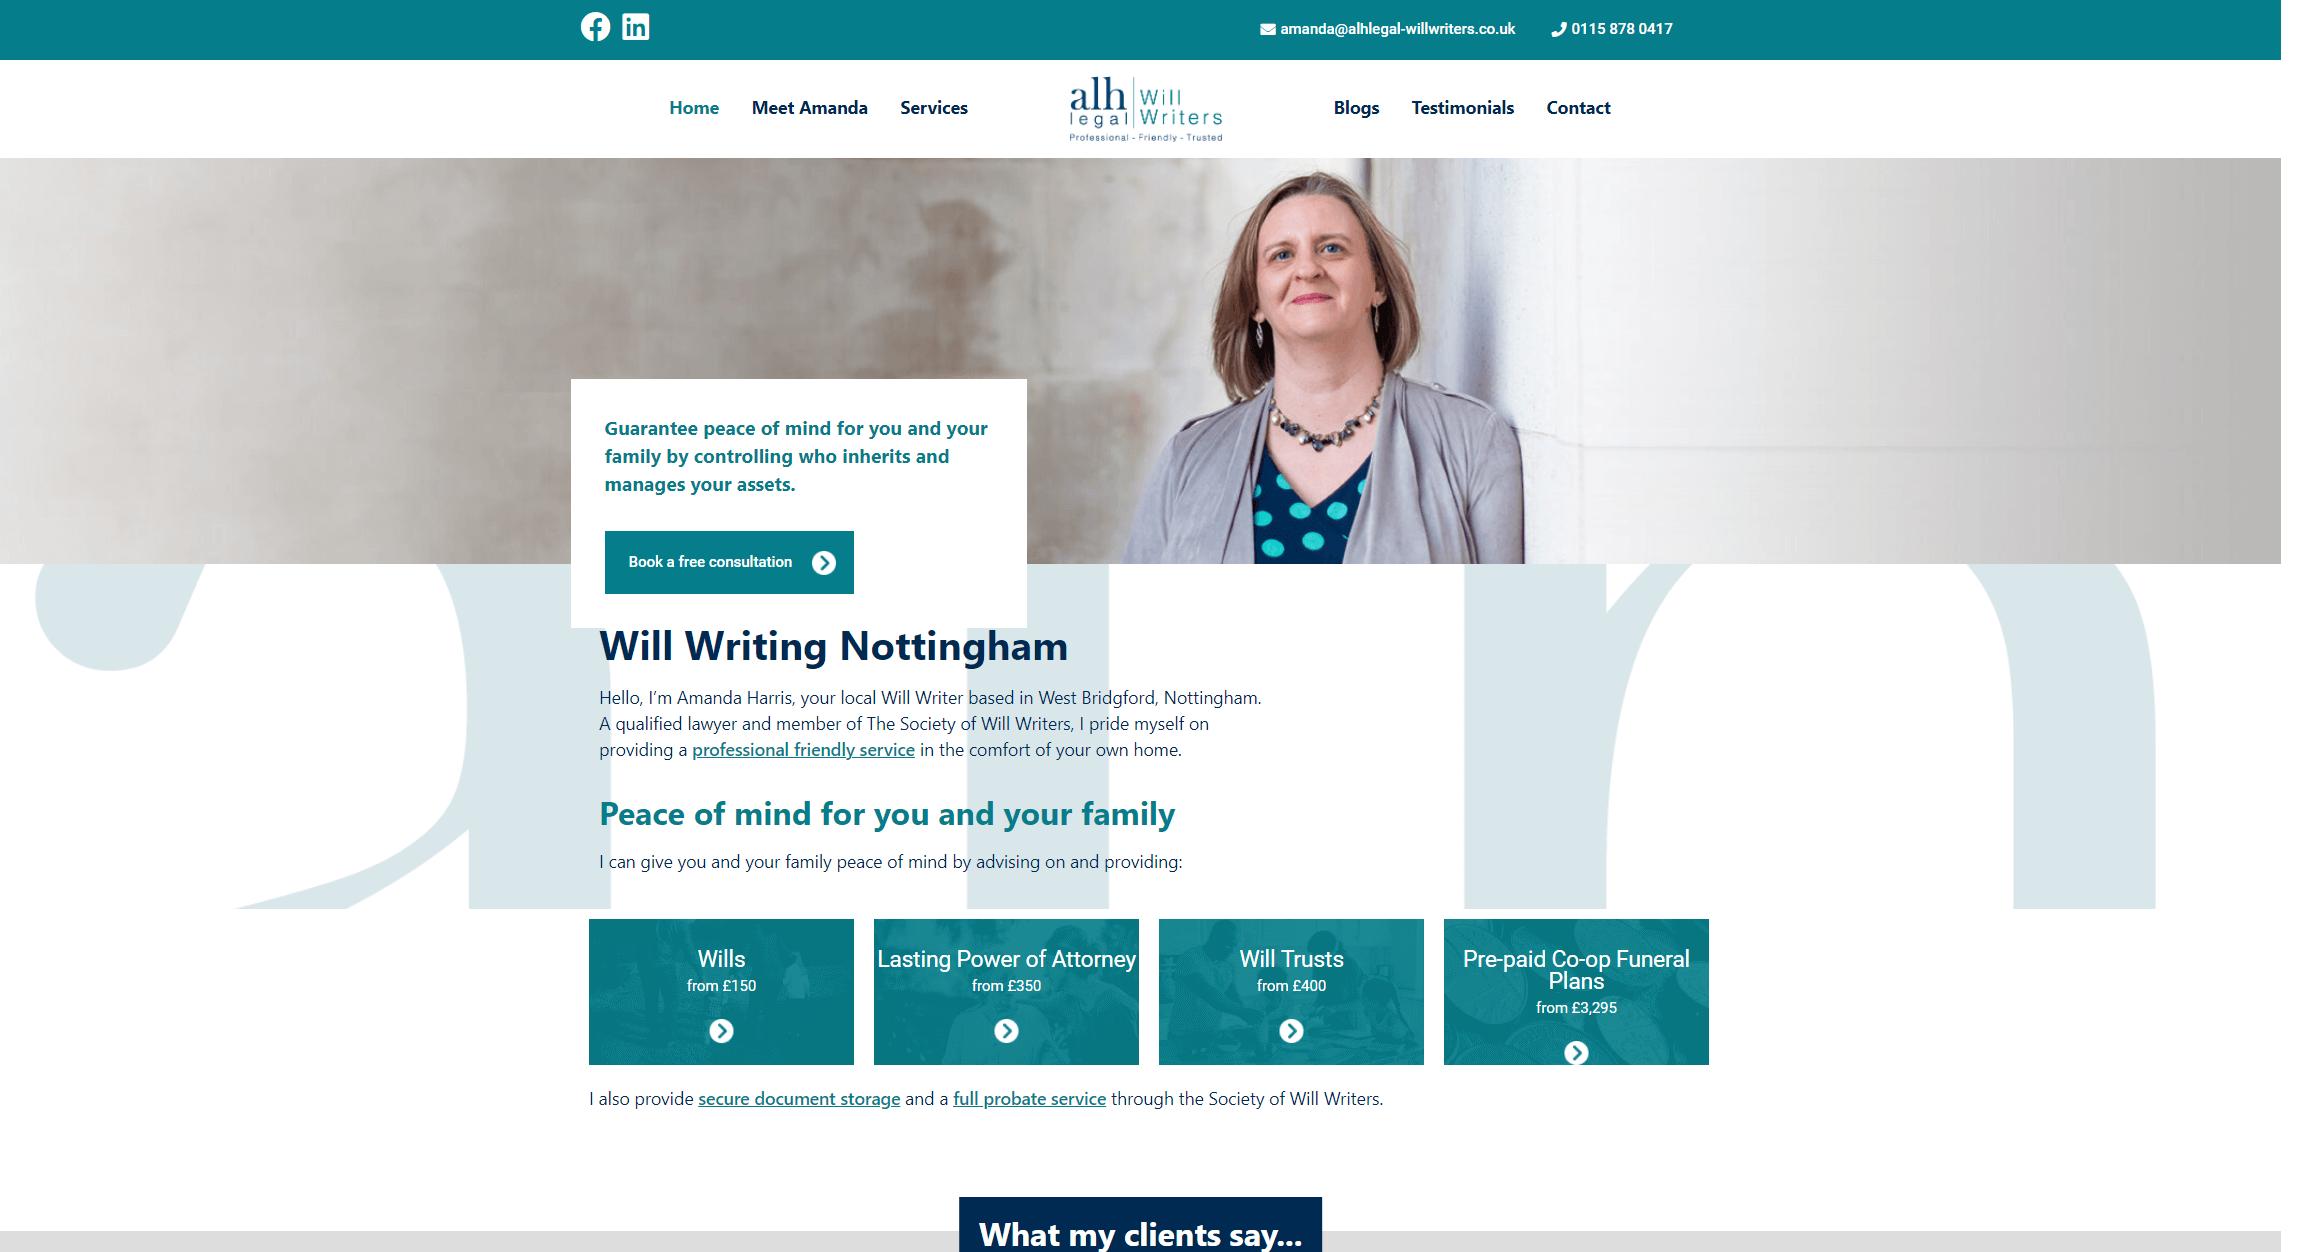 www.alhlegal-willwriters.co.uk